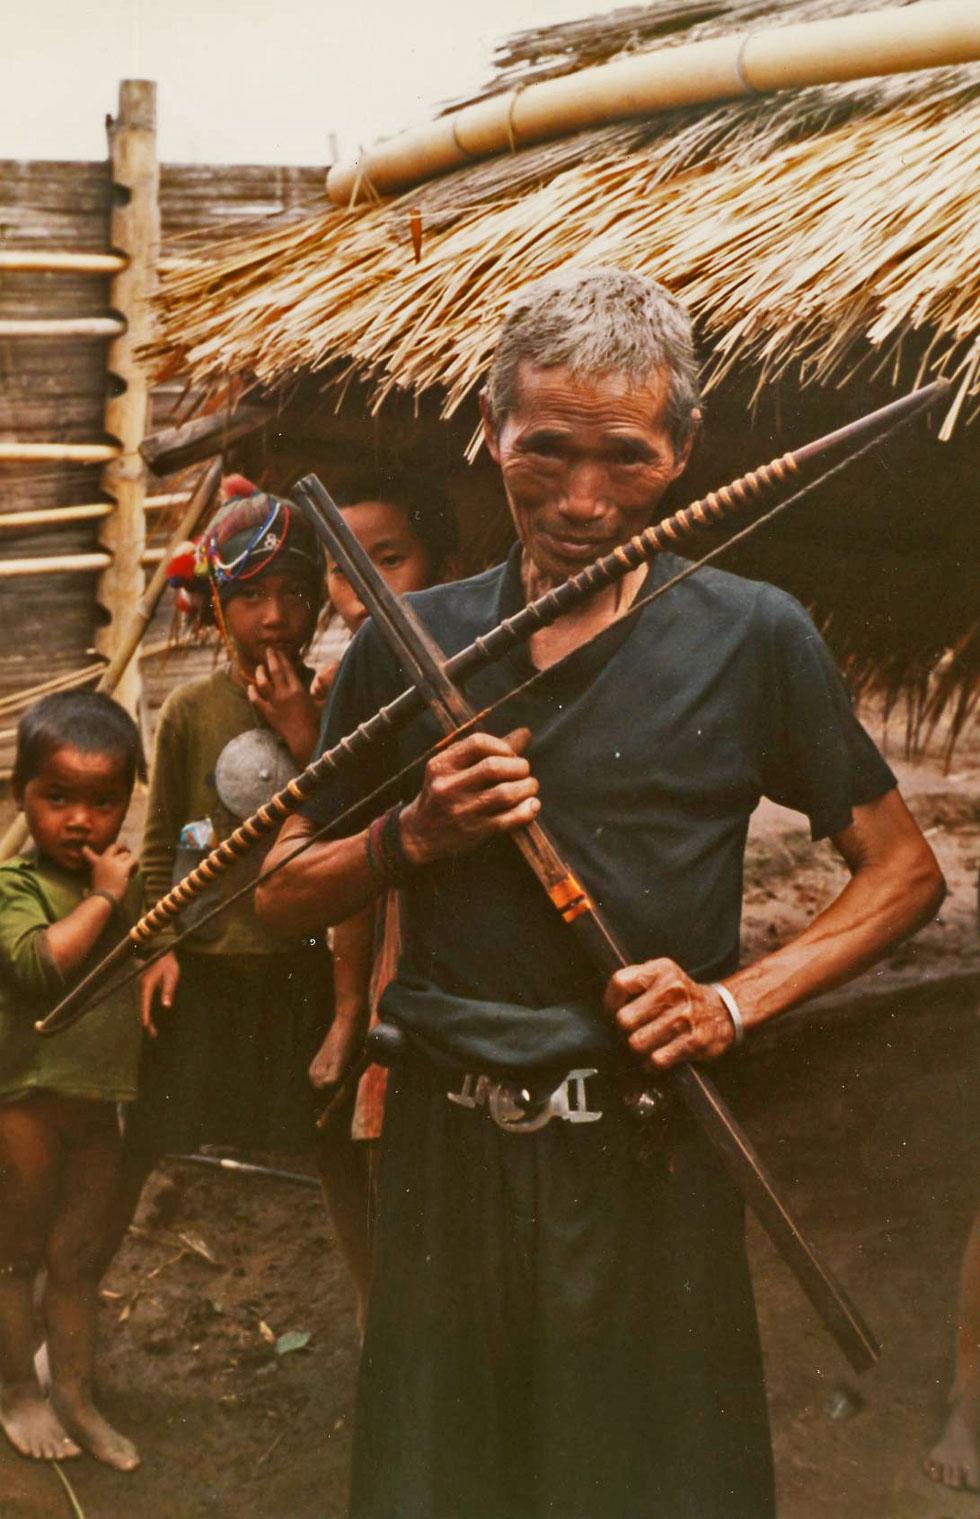 tribal-with-crossbow-thaila